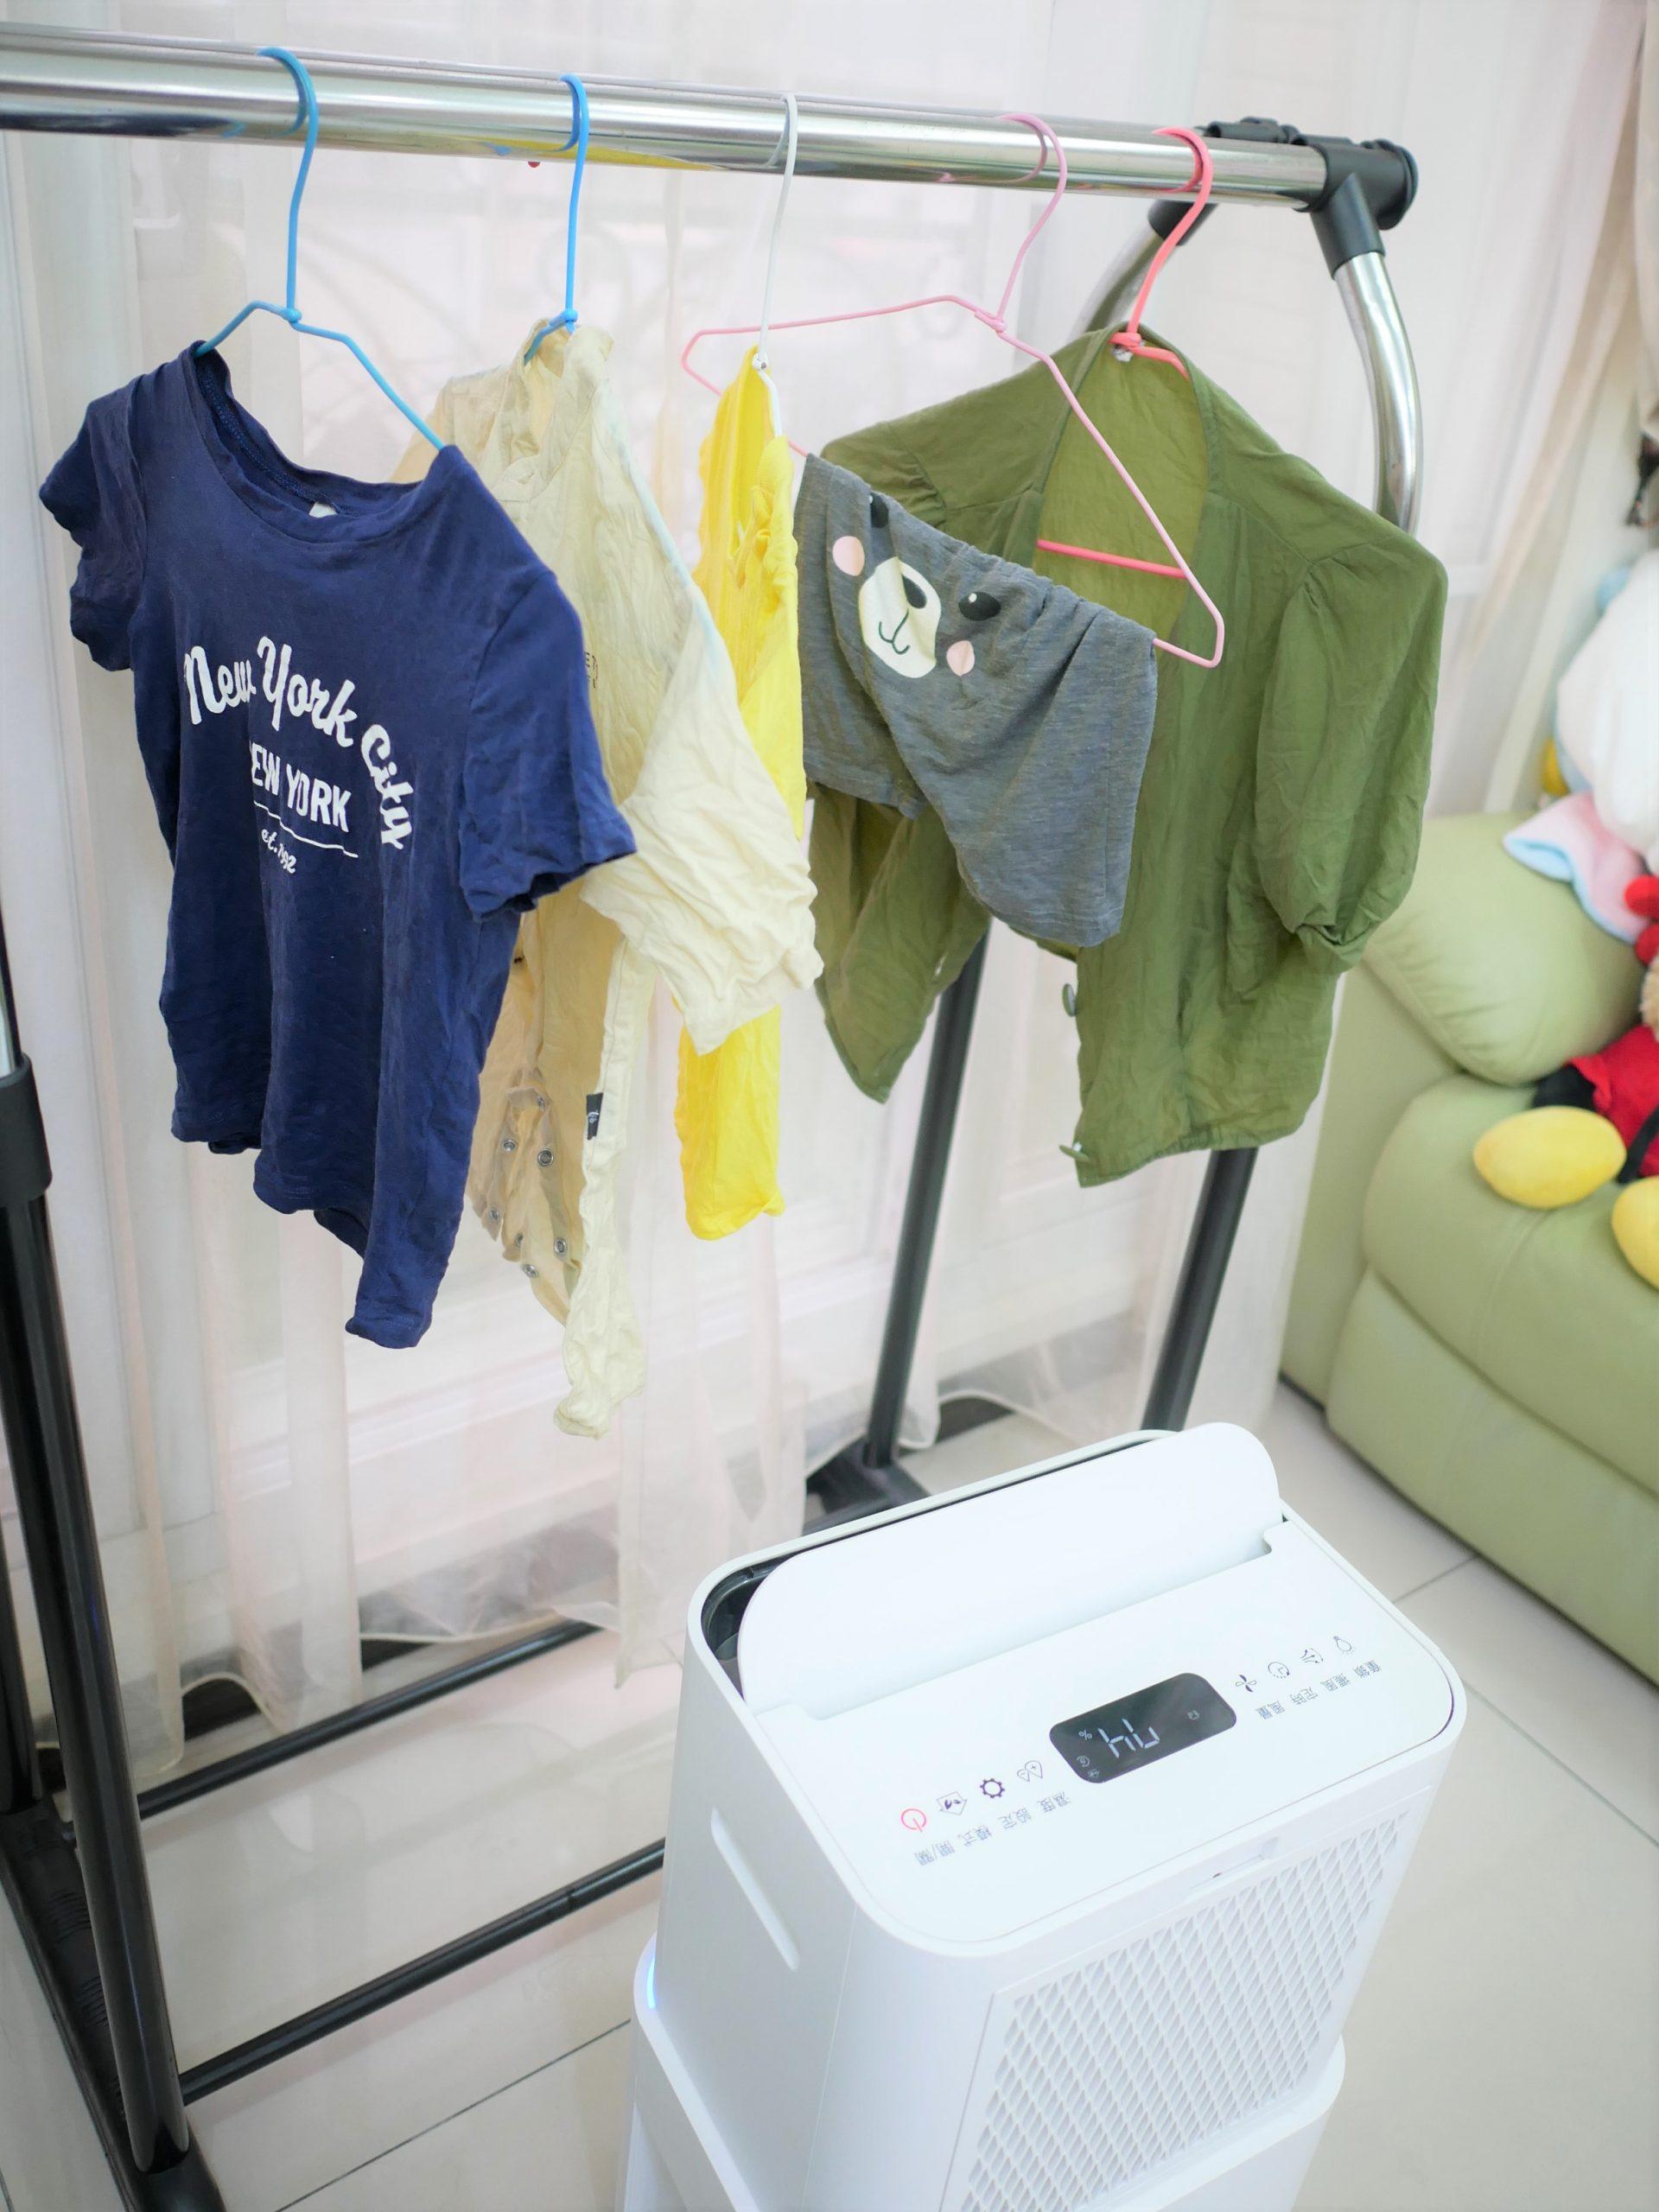 【IRIS除濕機團購優惠價】日本IRIS空氣清淨除濕機,除濕機+空氣清淨機+烘衣機一機三用超強家電 @小環妞 幸福足跡